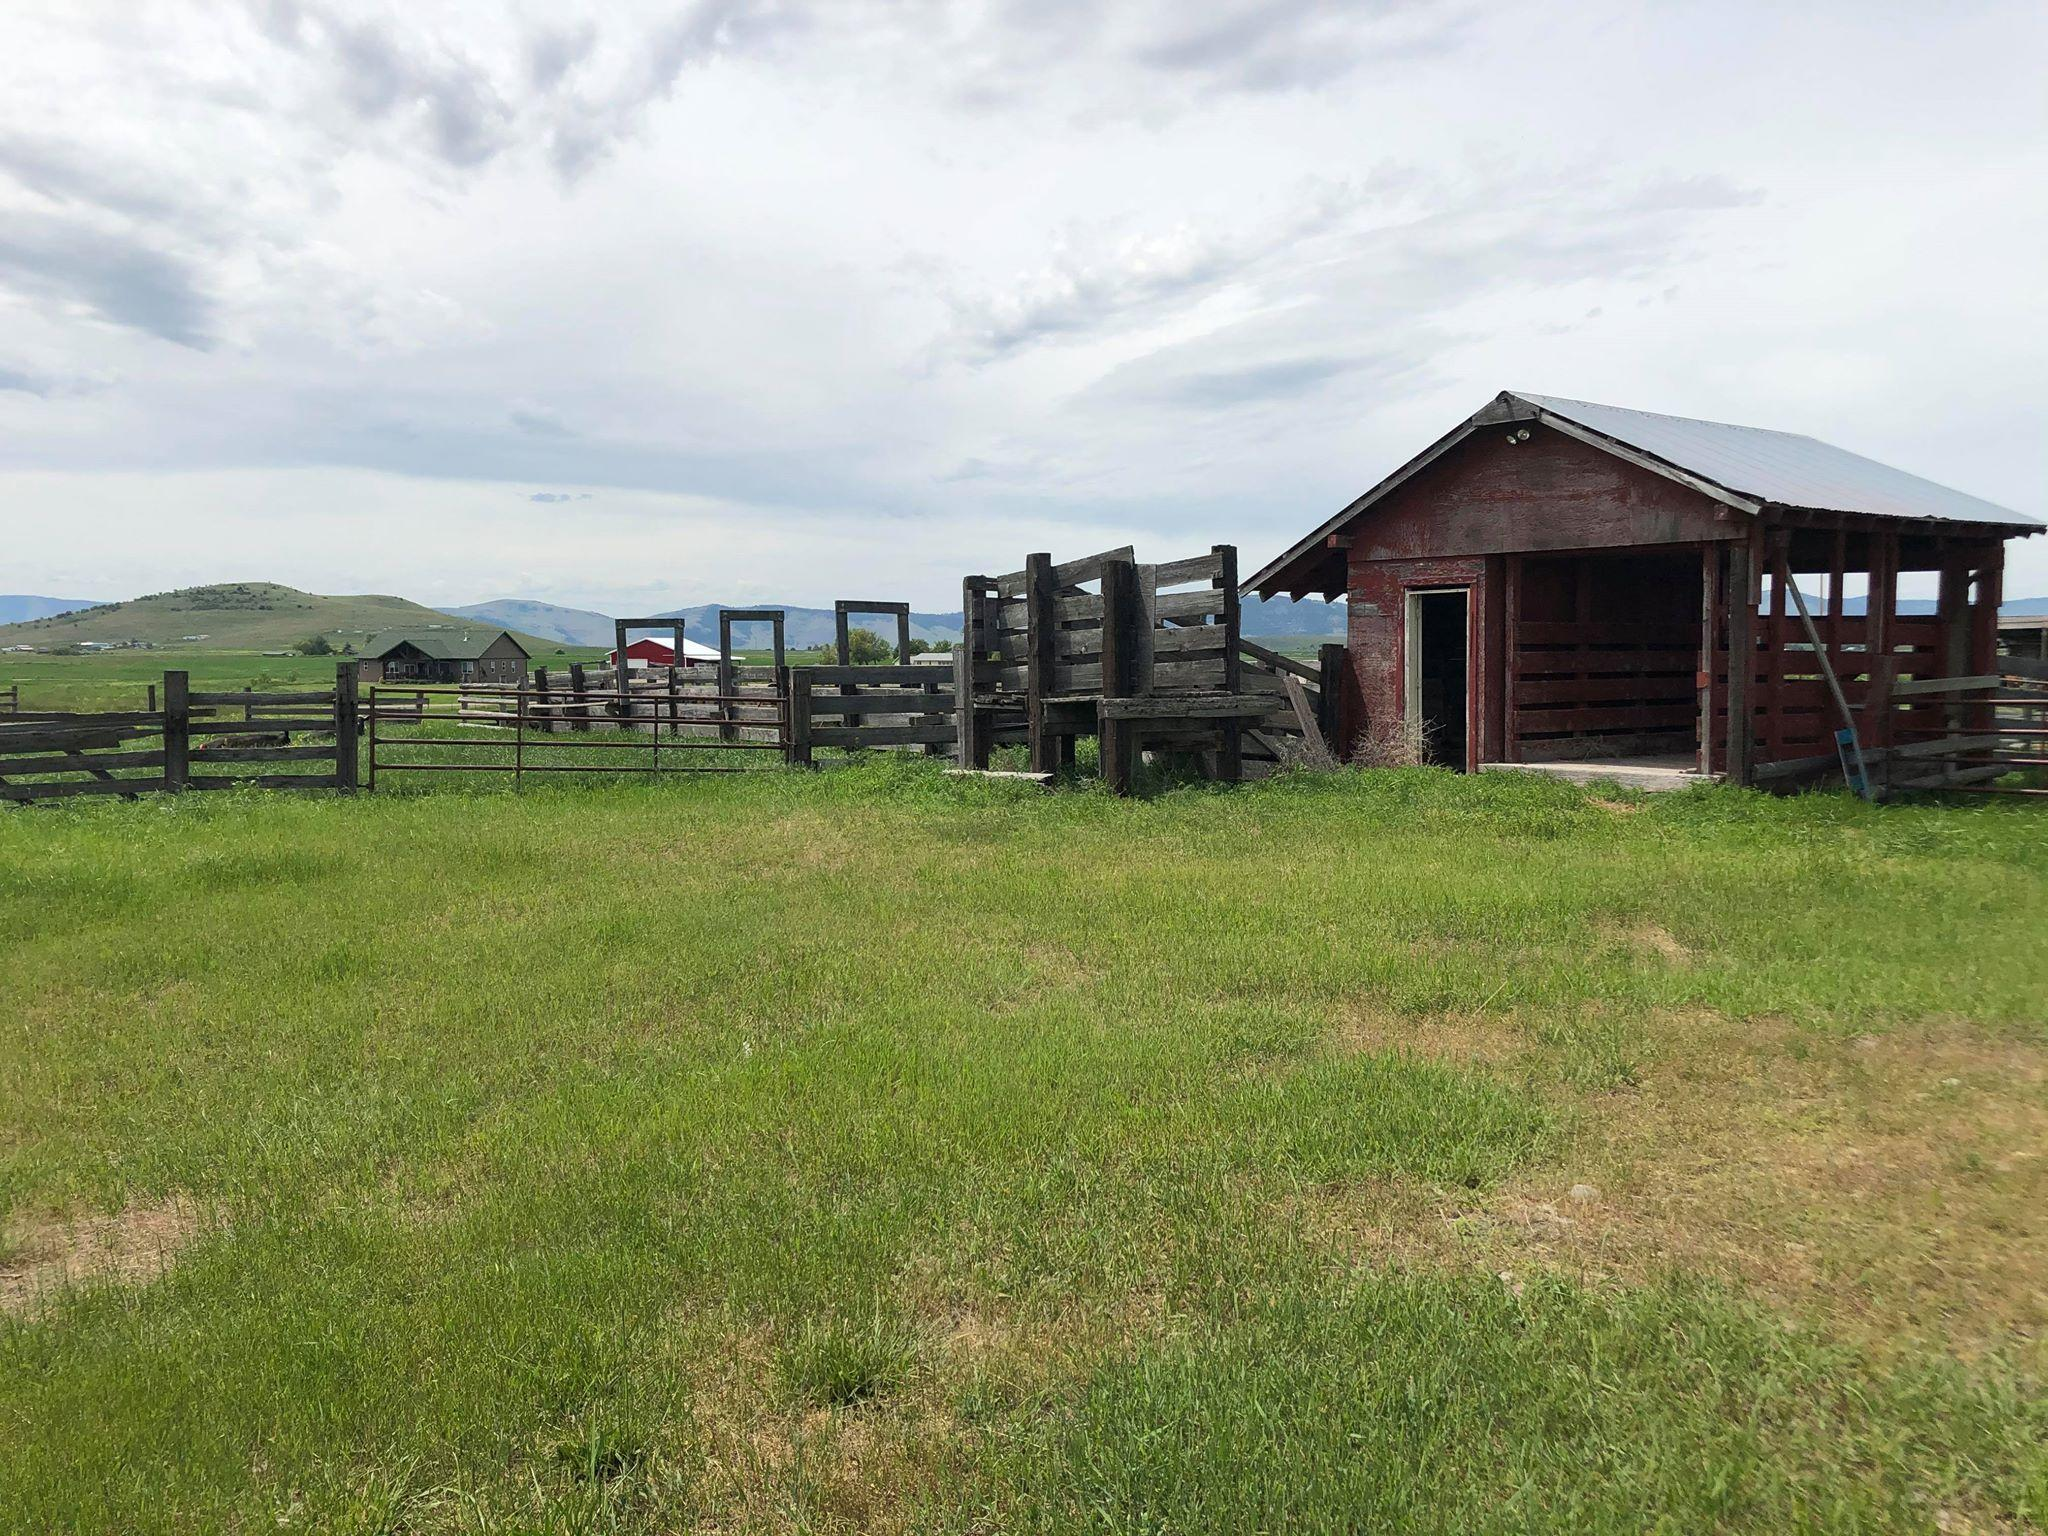 Scale House, Calf chutes, Corrals